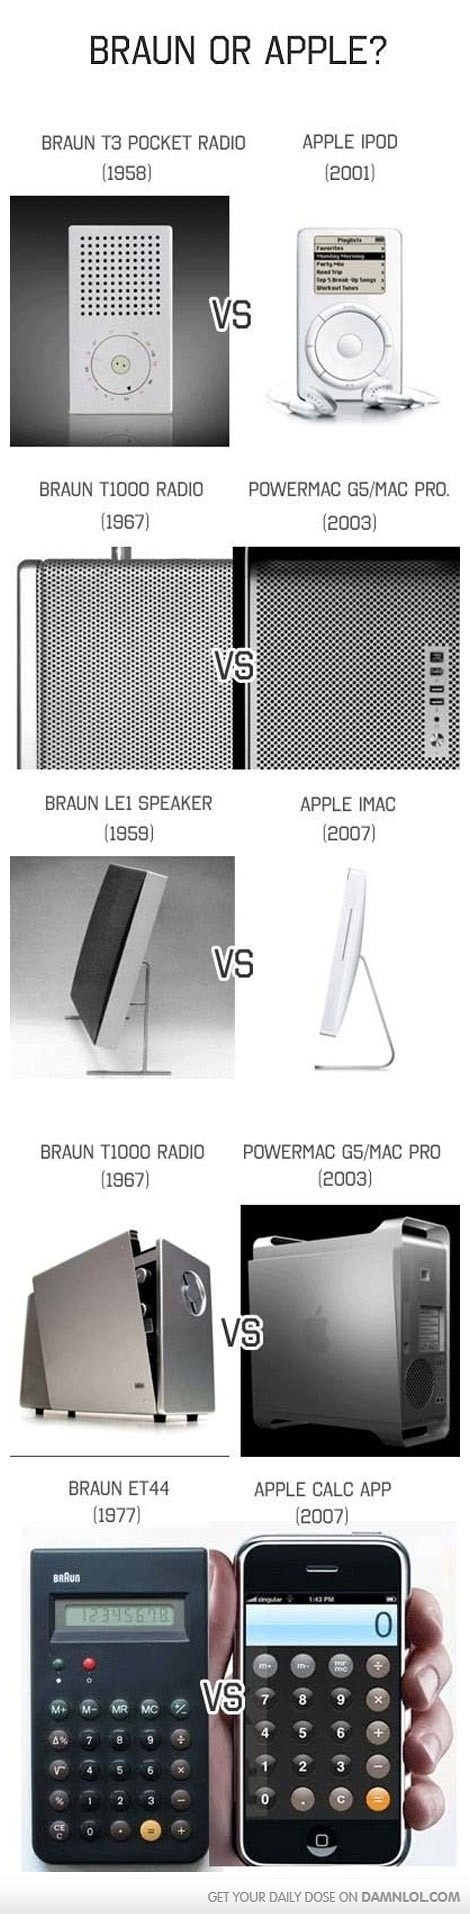 Braun or Apple?